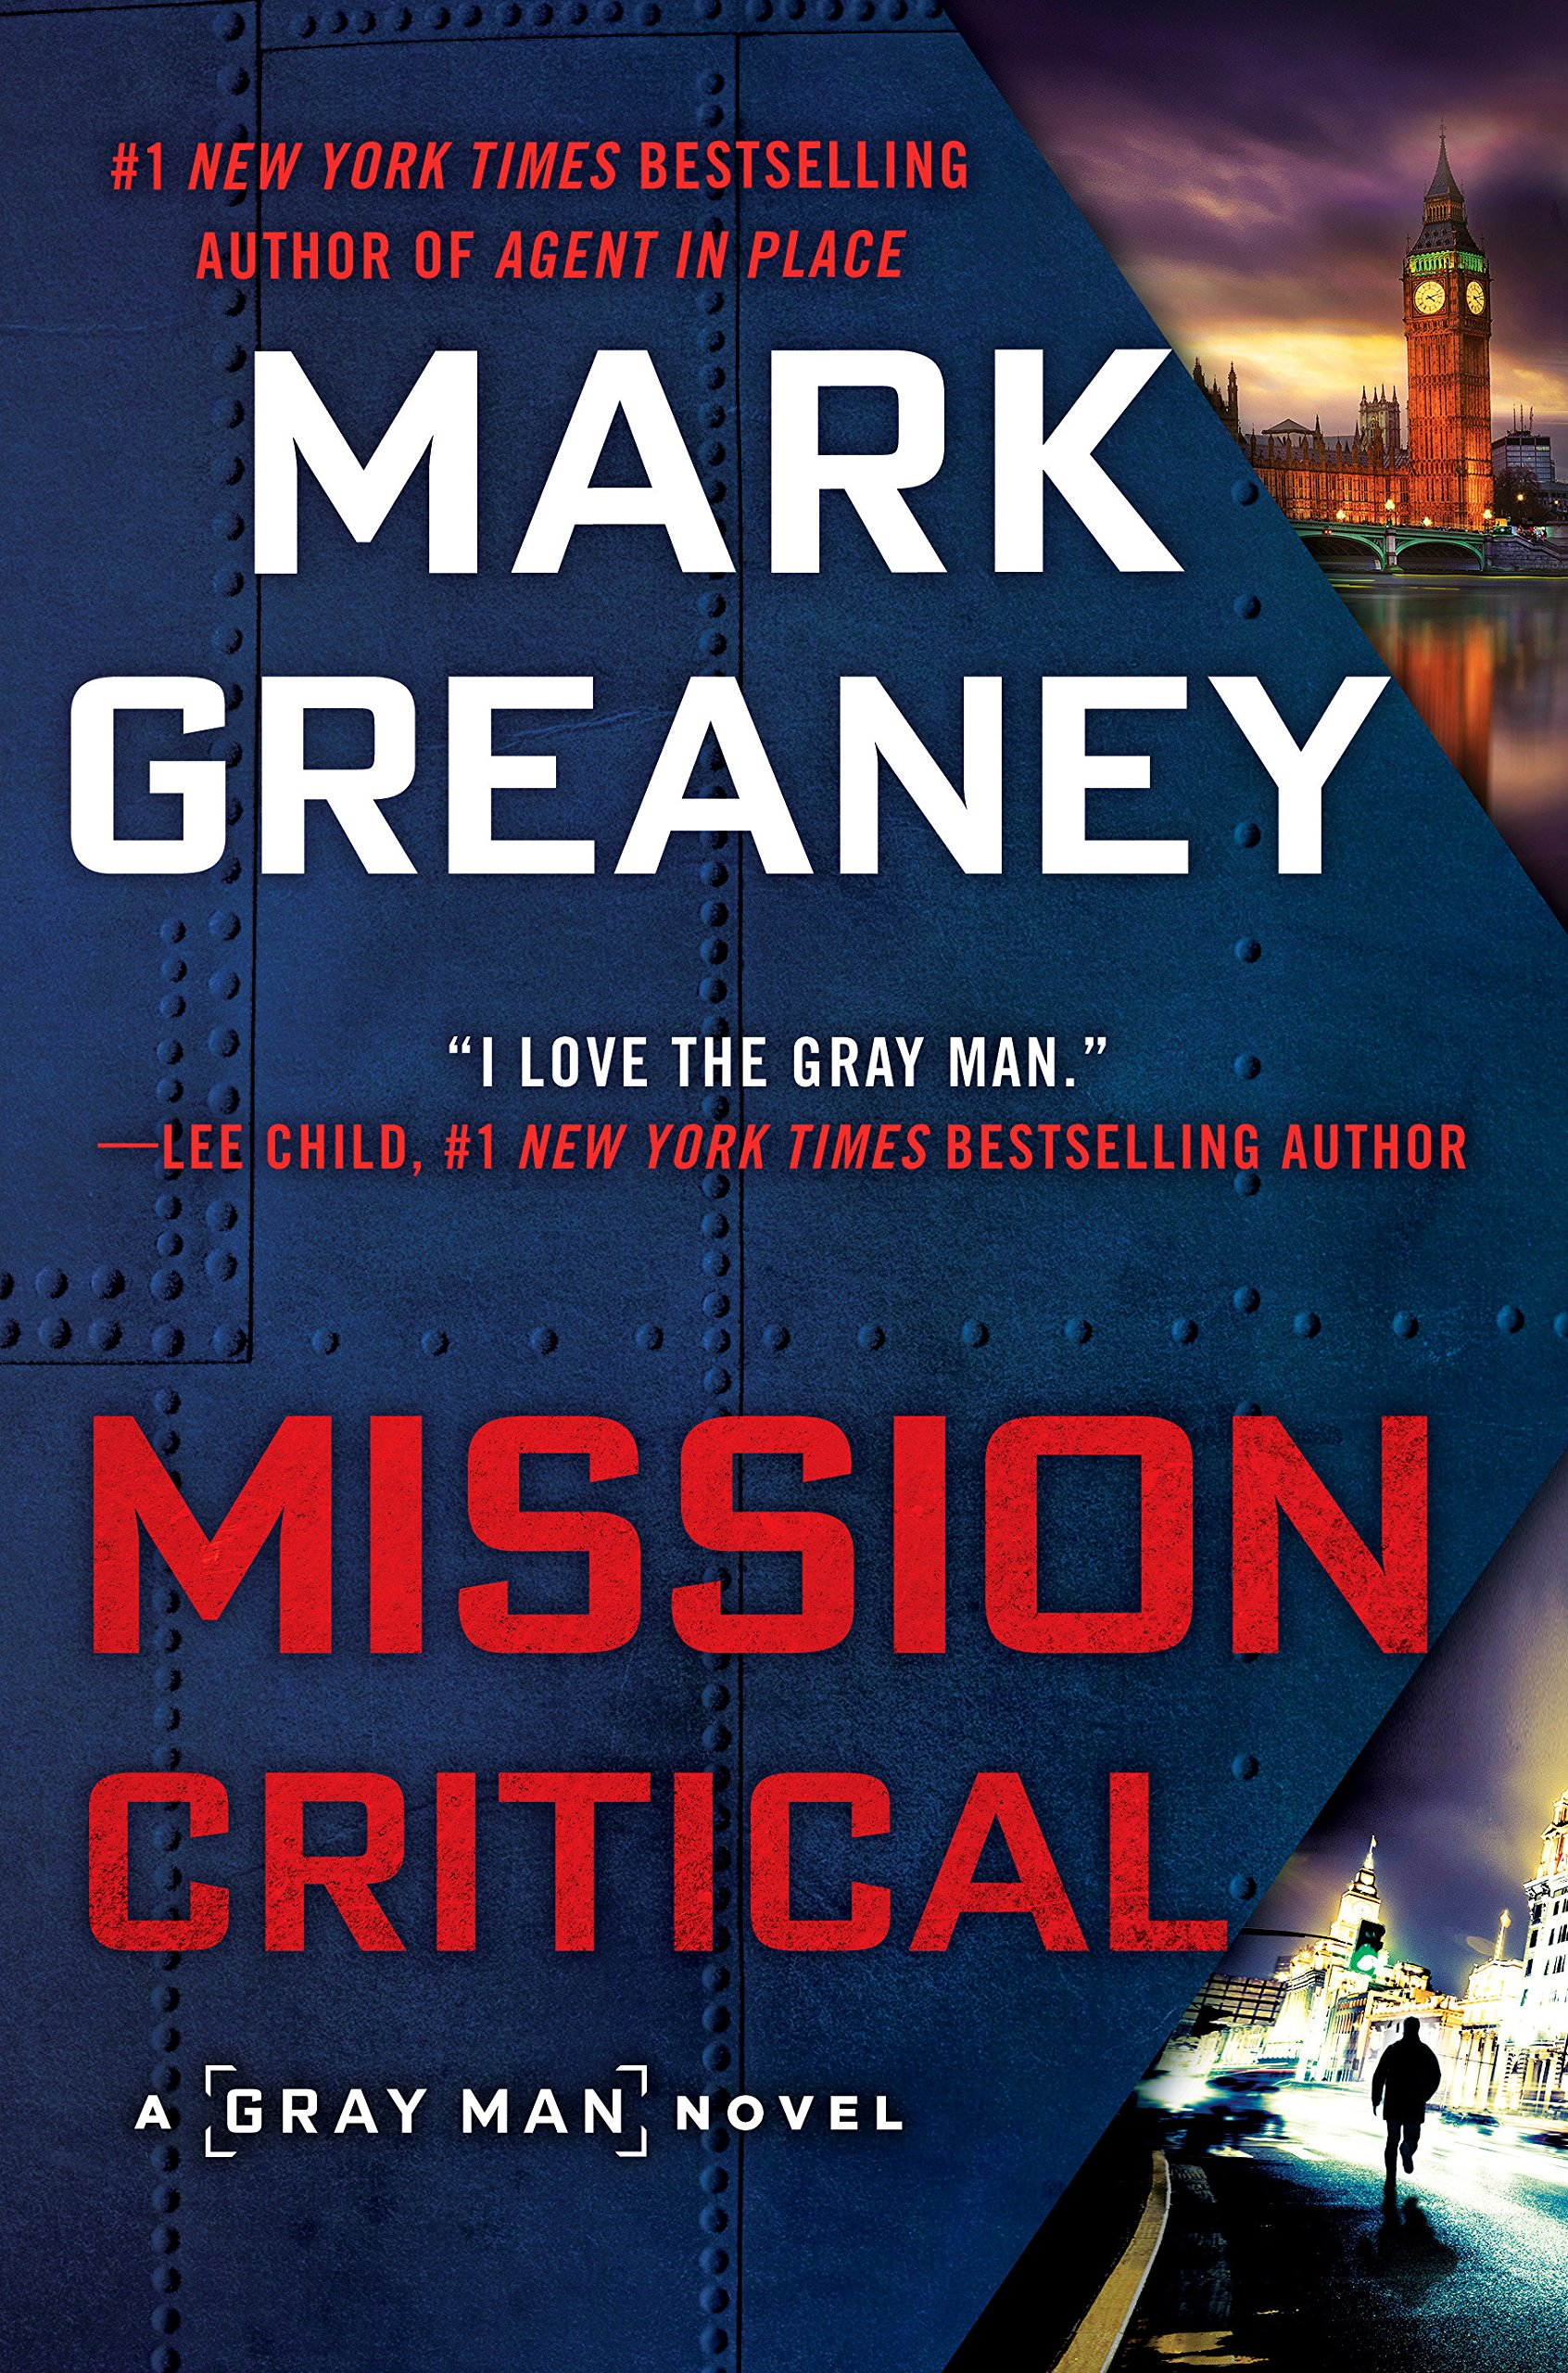 mission critical.jpg